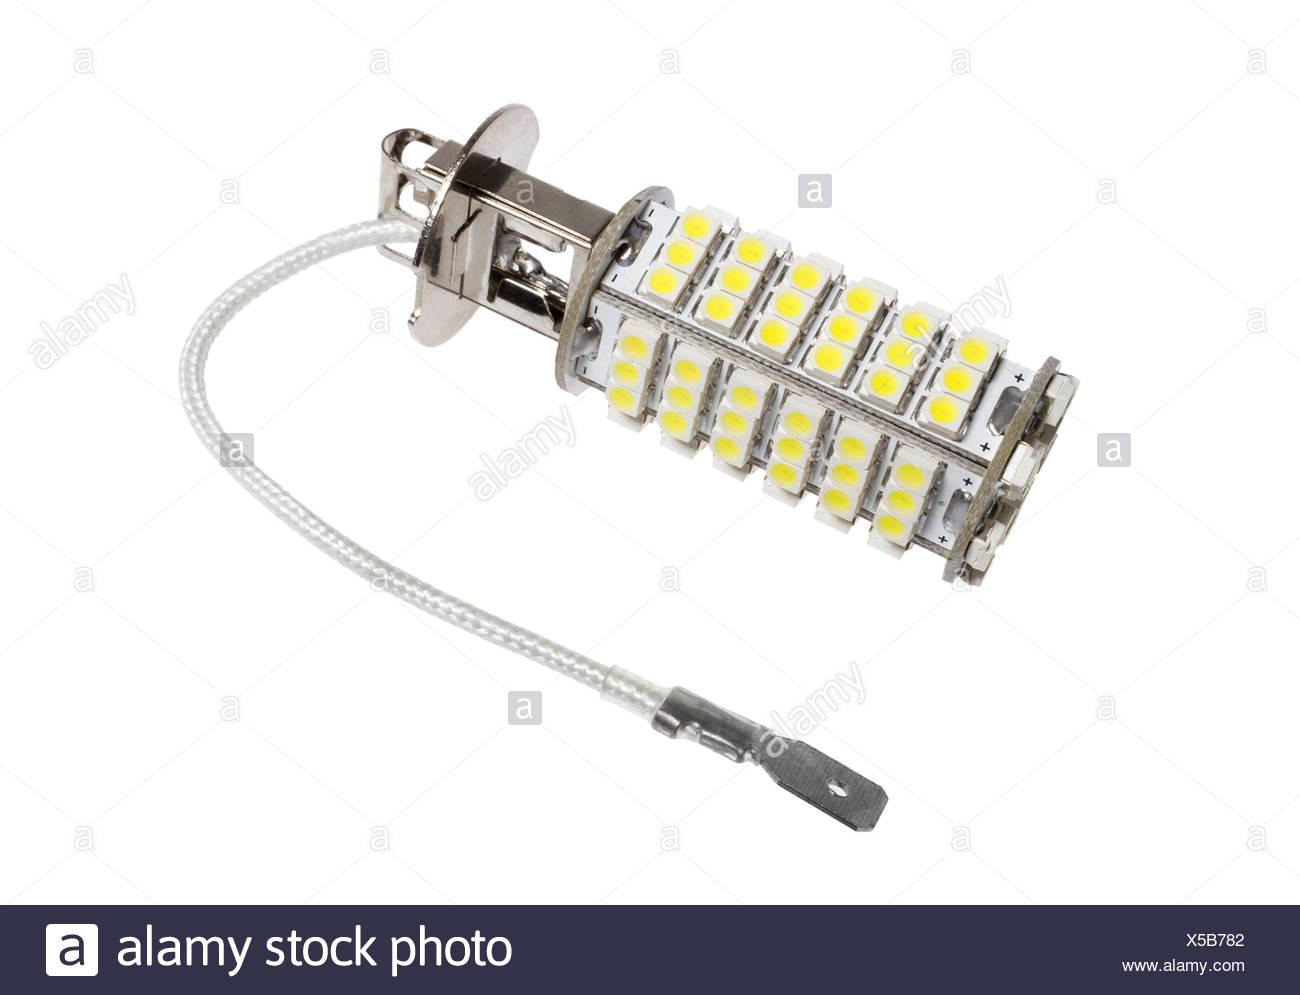 Auto Led Lampen : Led lampe für auto stockfoto bild alamy